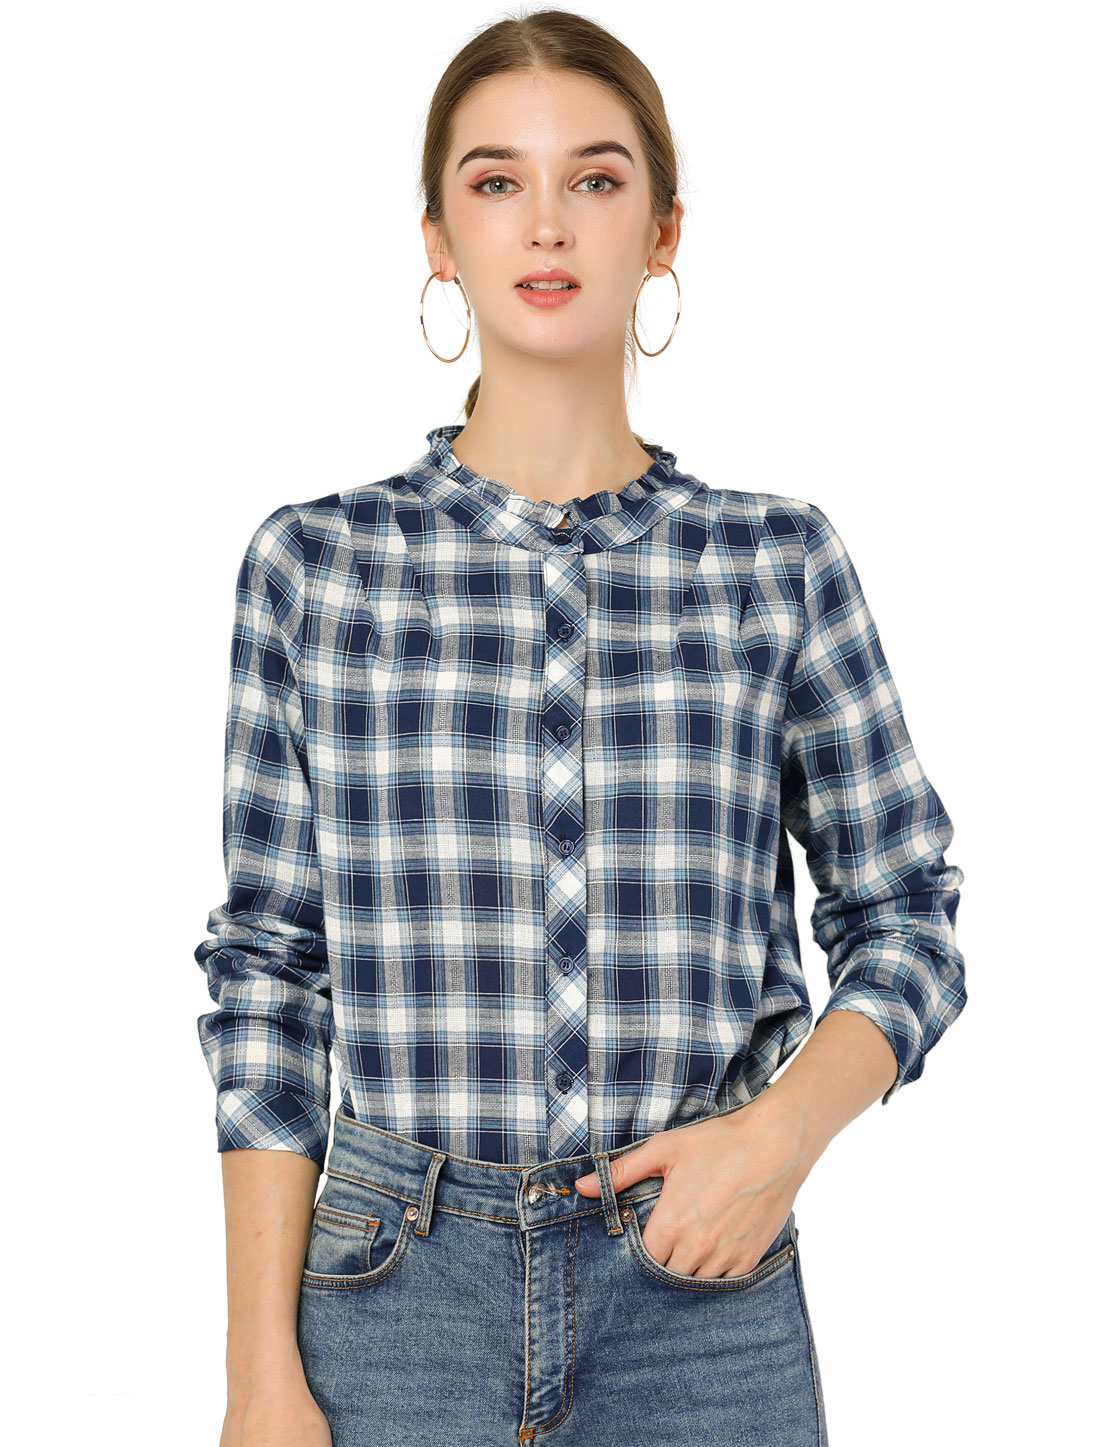 Allegra K Women's Fall Blouse Long Sleeve Ruffle Plaid Shirt Blue XS (US 2)